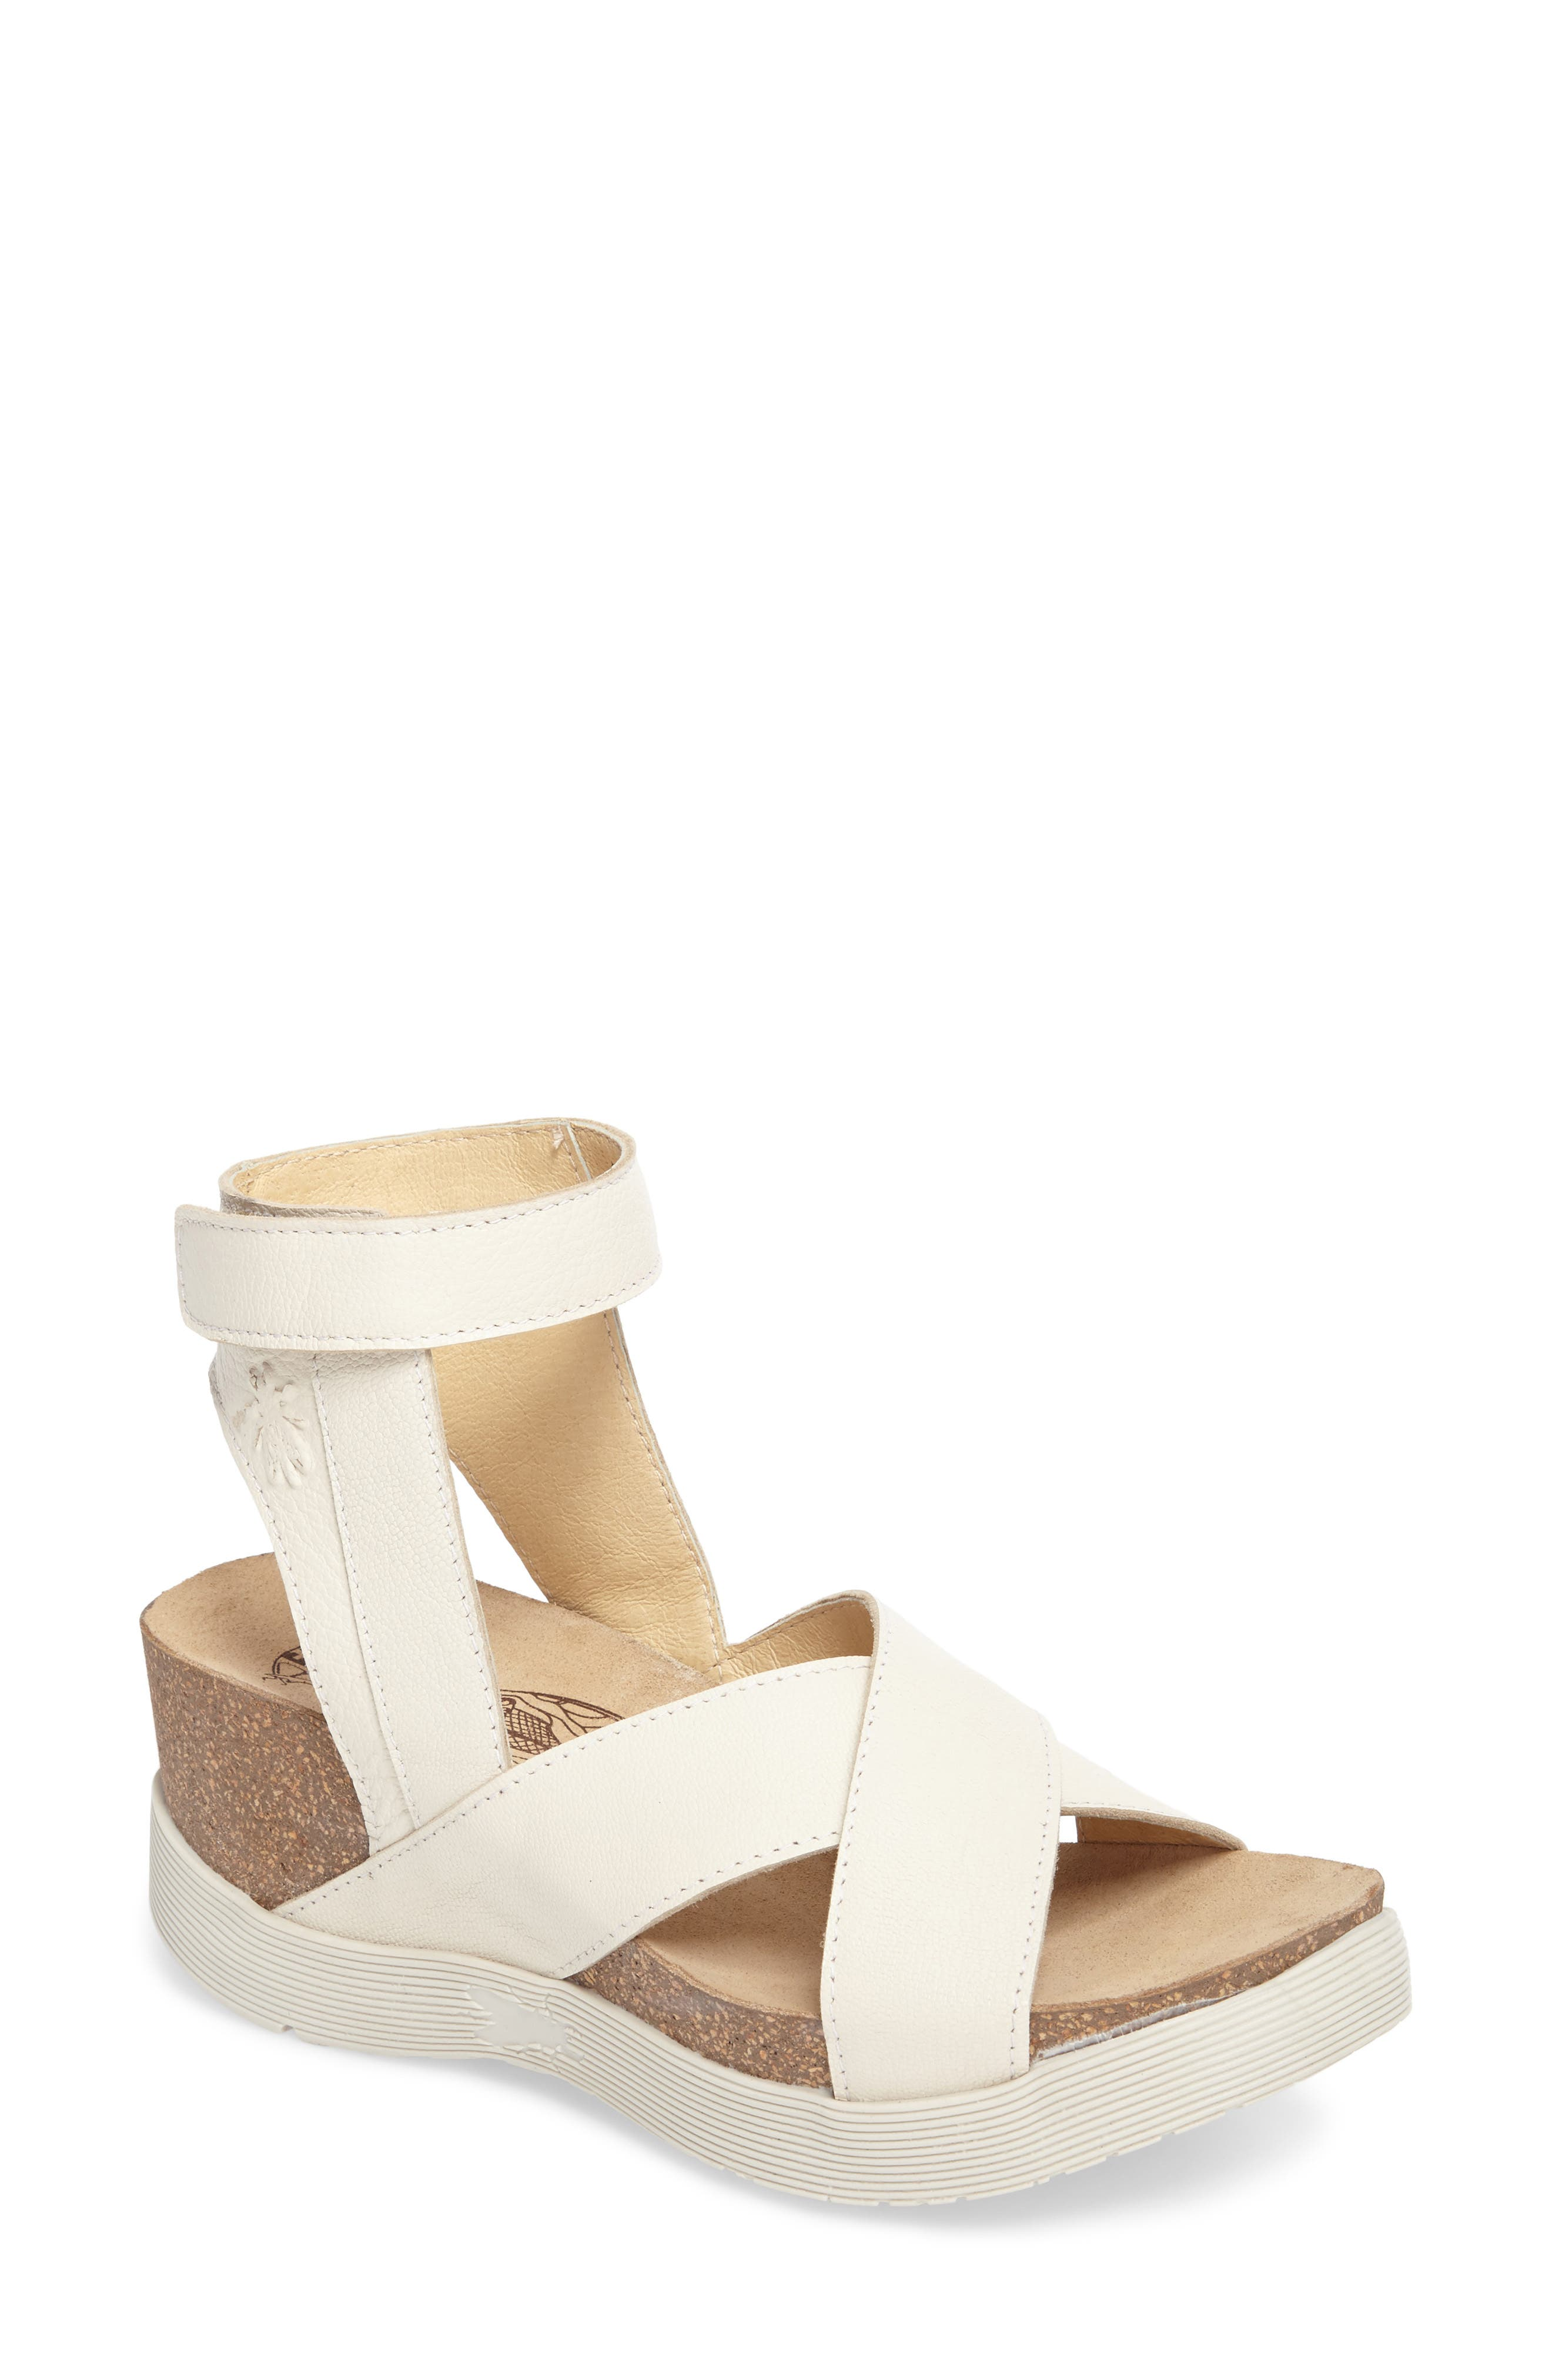 Main Image - Fly London Weel Nubuck Leather Platform Sandal (Women)